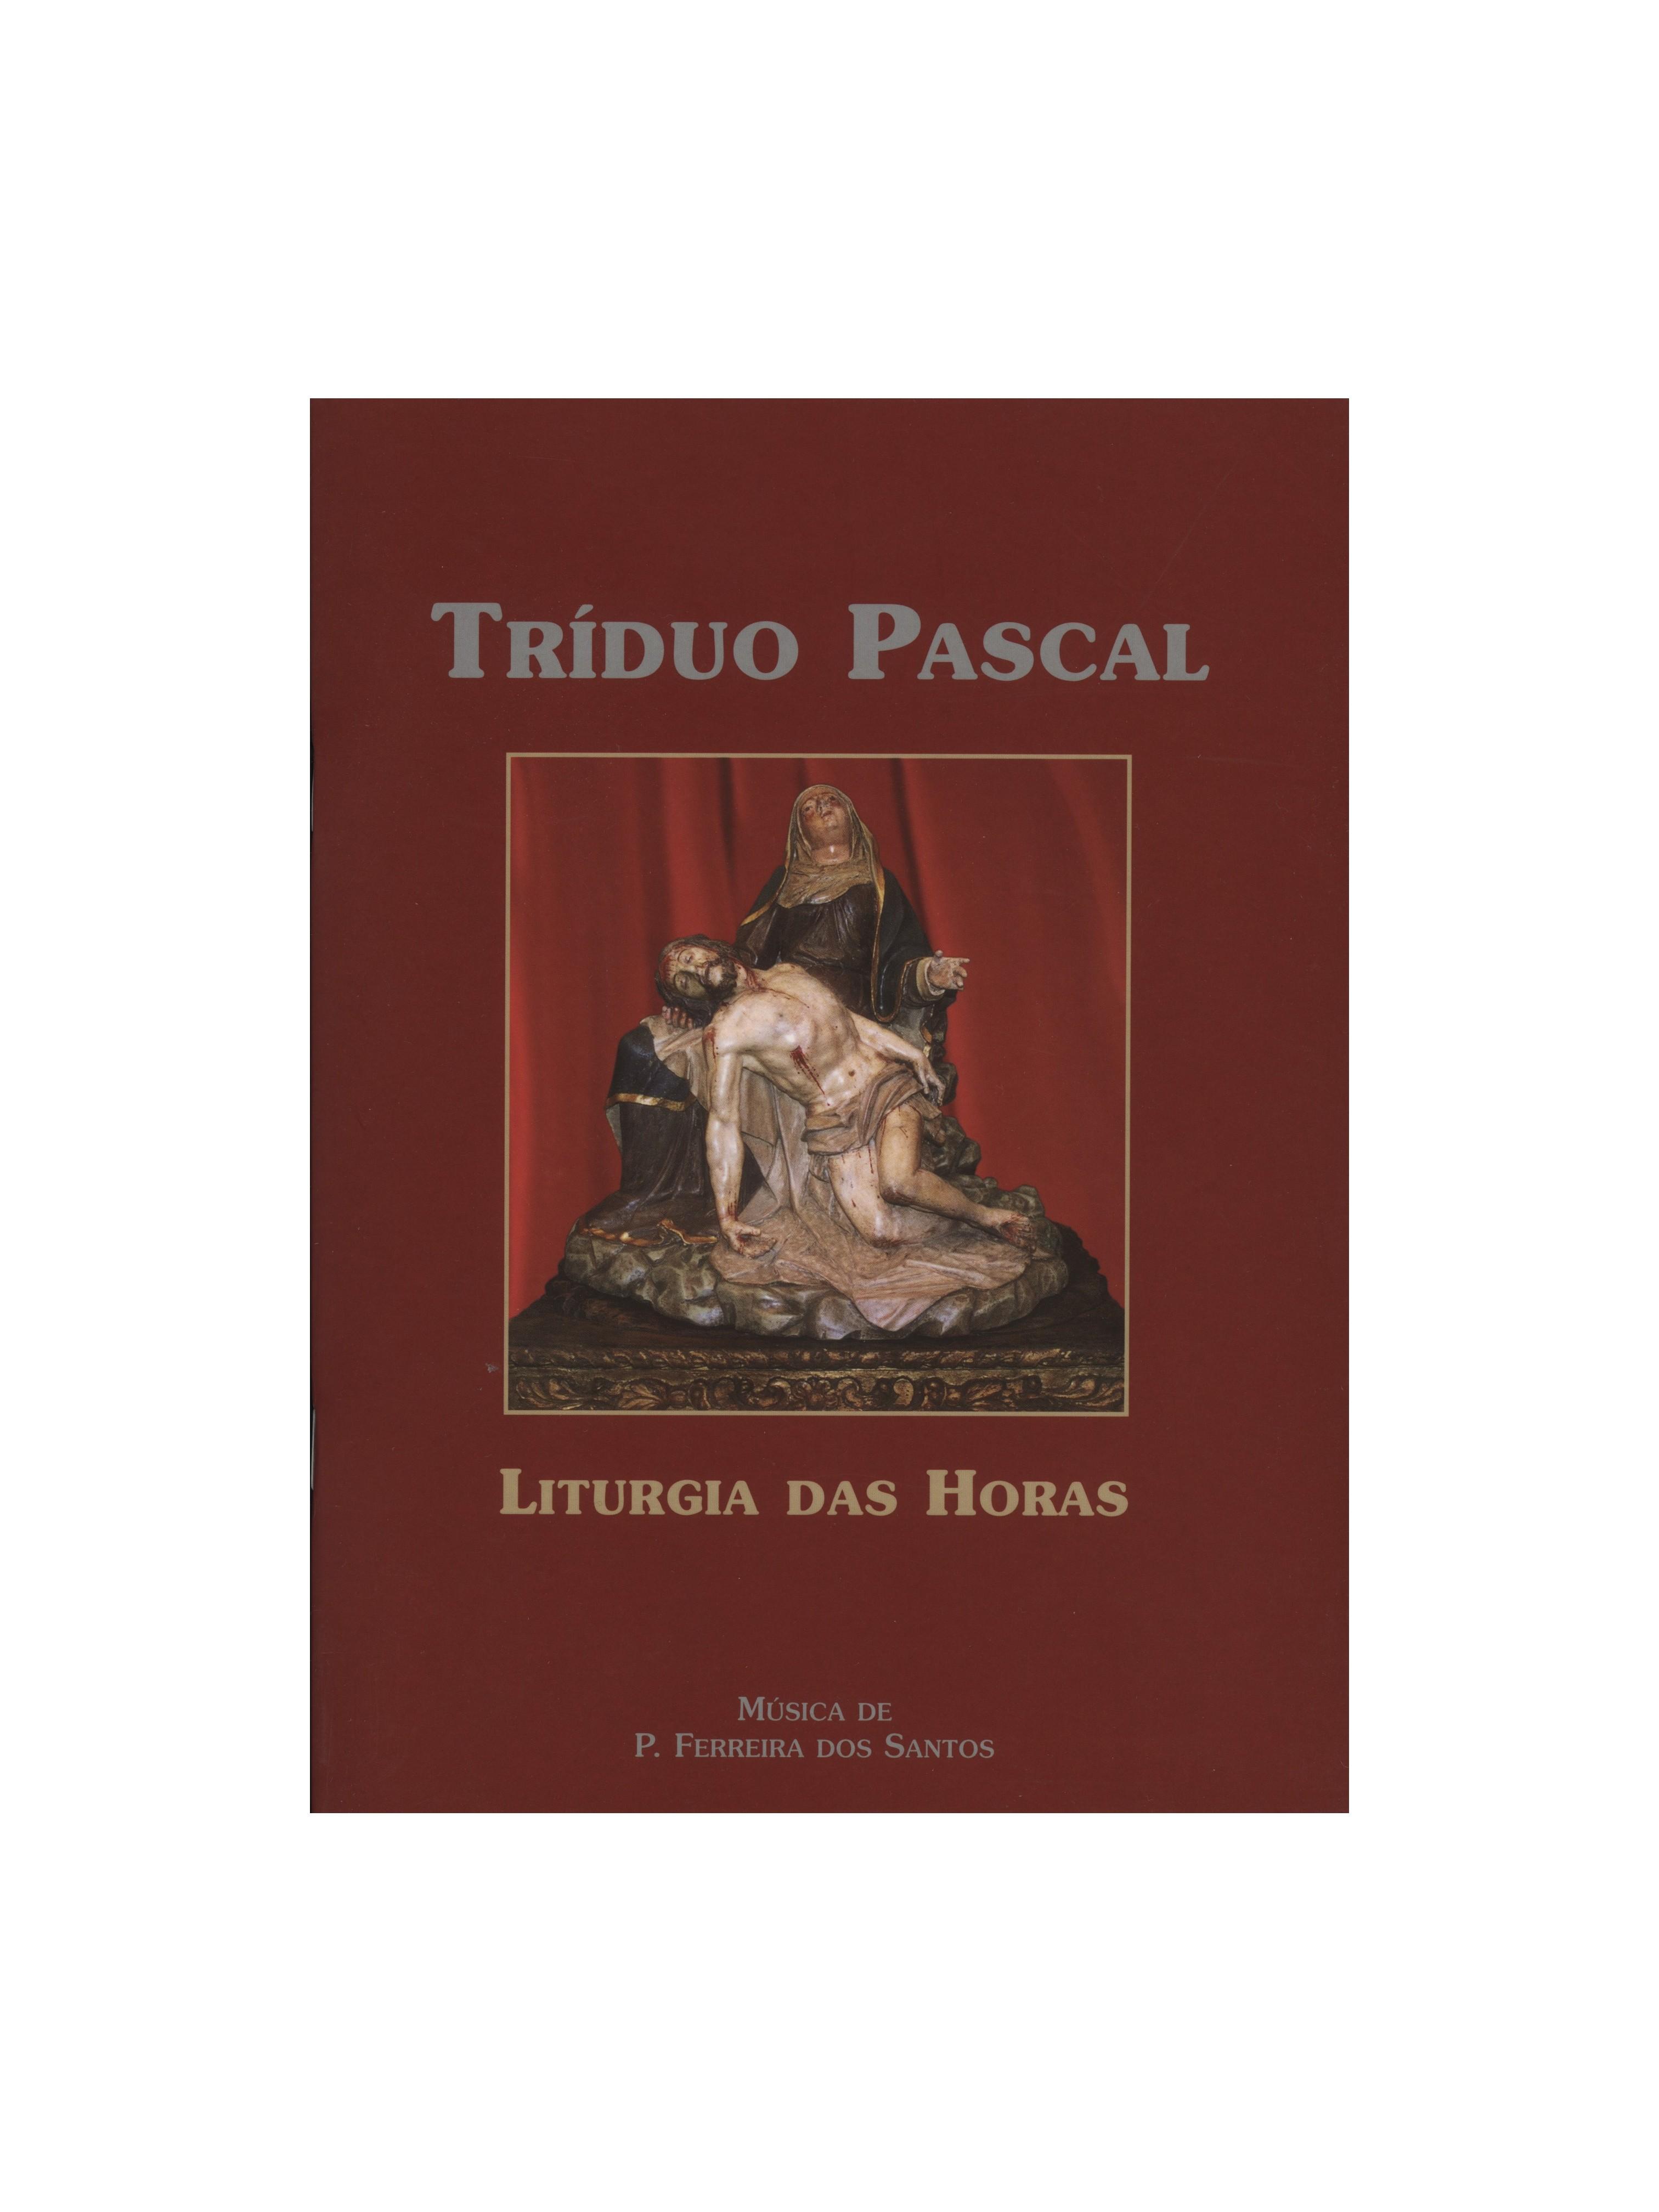 Liturgia das Horas – Tríduo Pascal